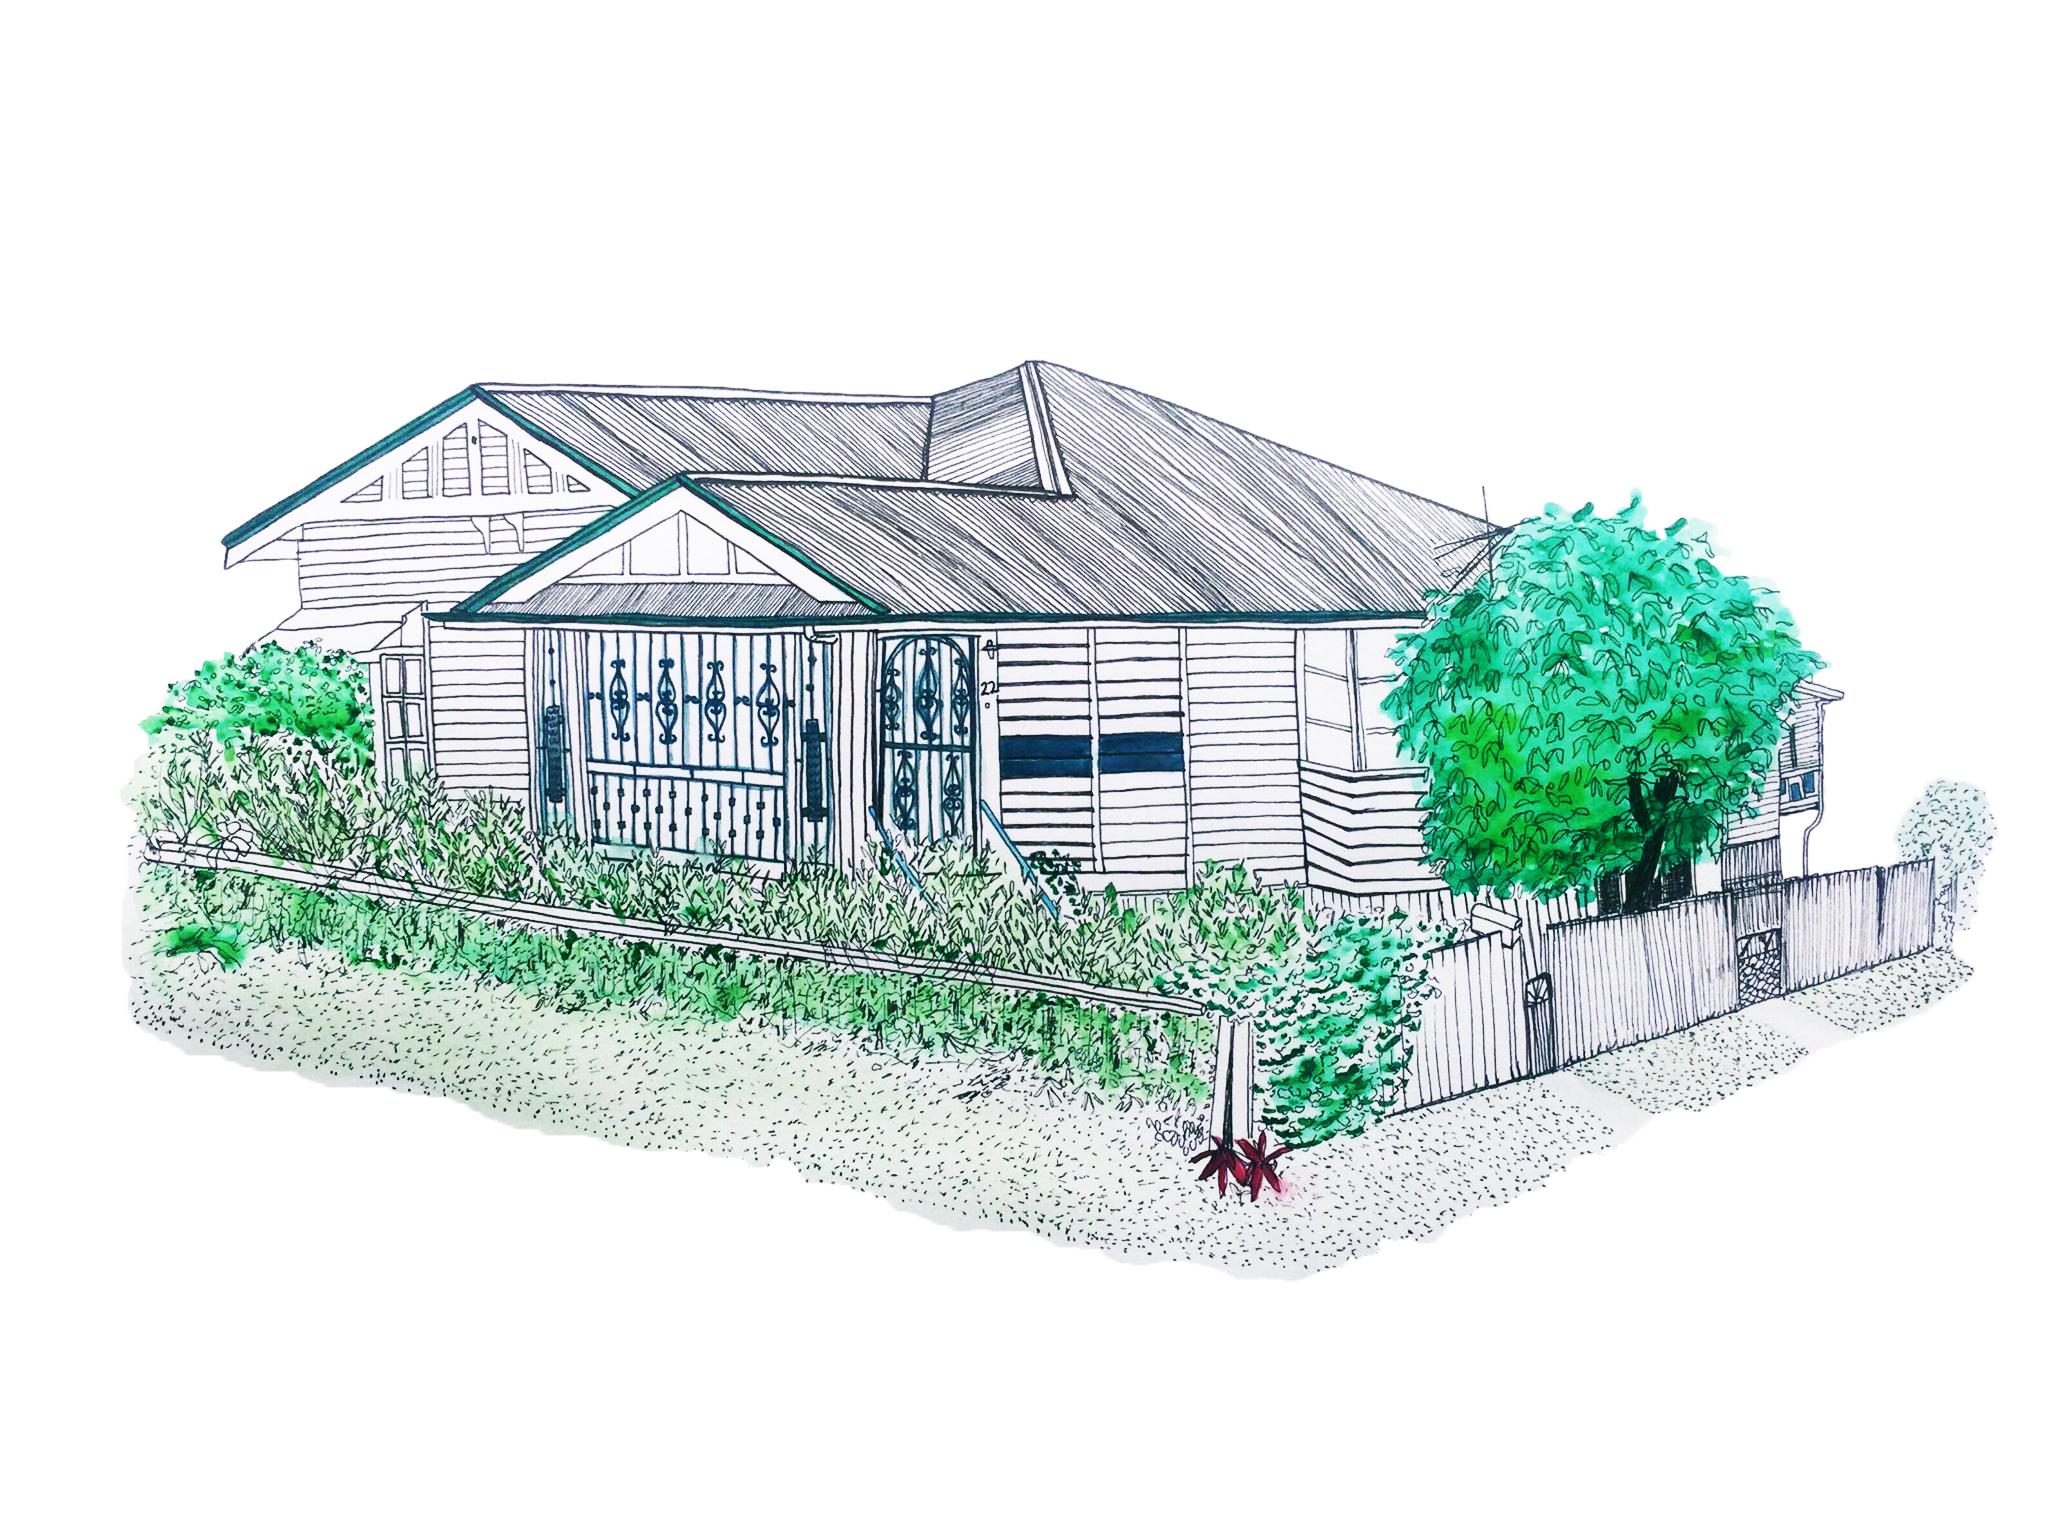 #5 Anika's House